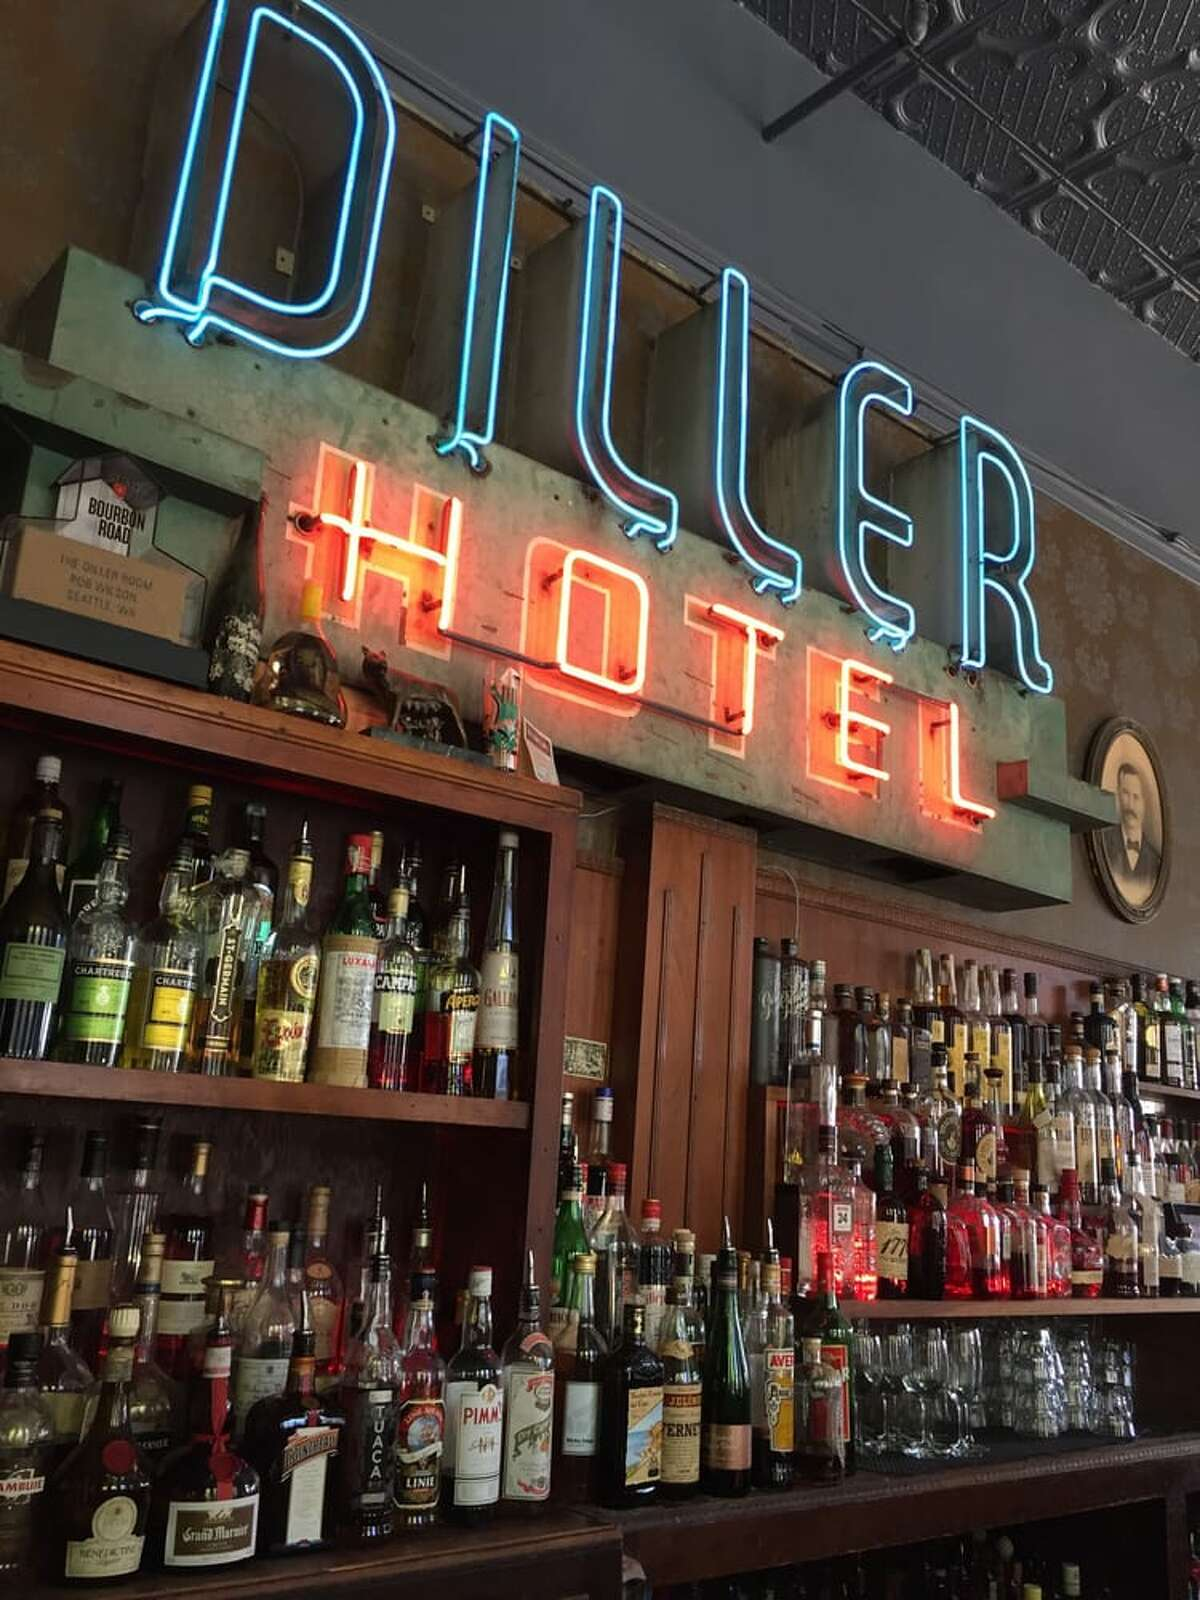 Diller Room